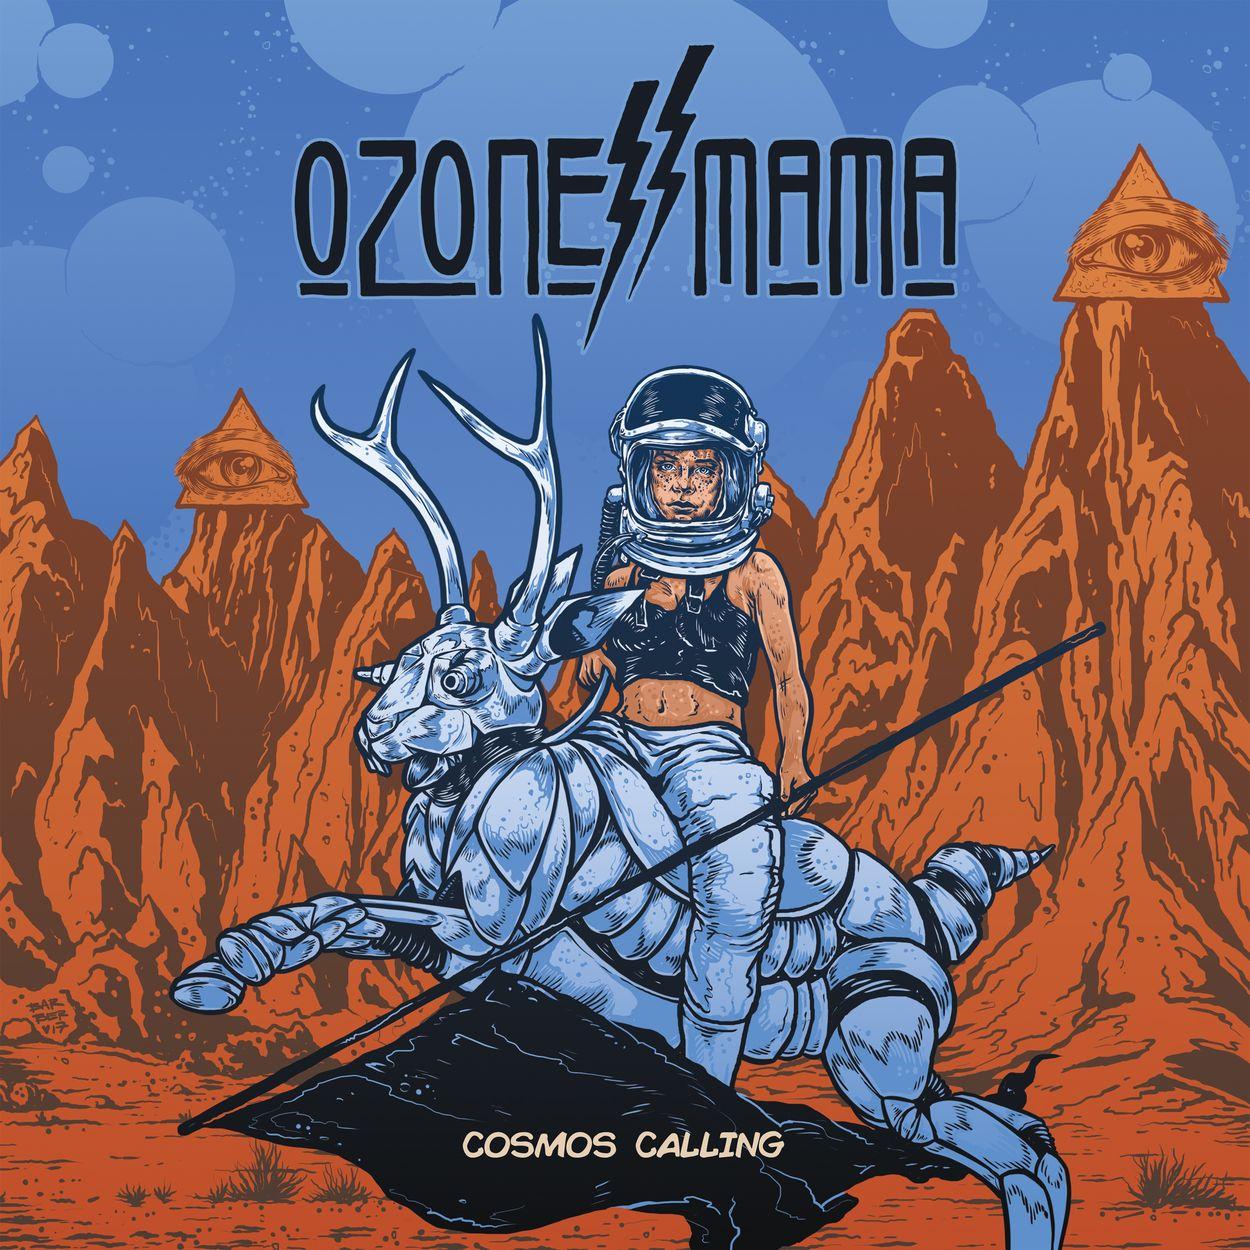 ozone_mama_front_cosmos_calling_press.jpg